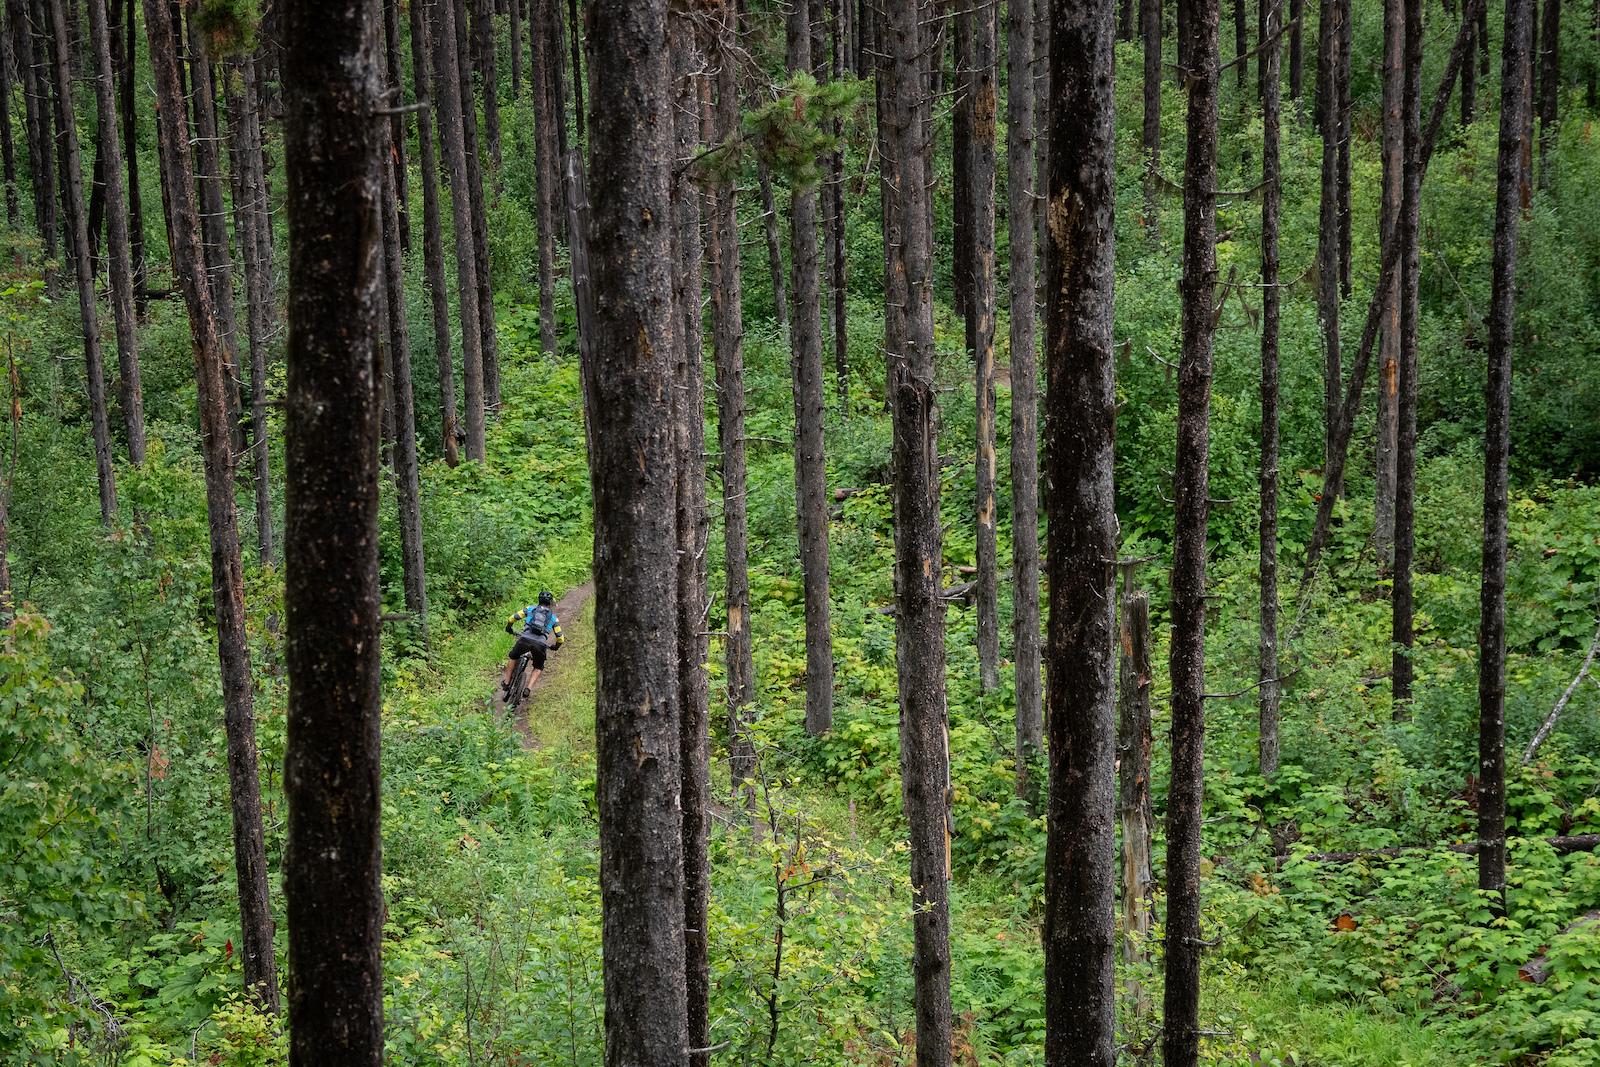 Pine slalom course